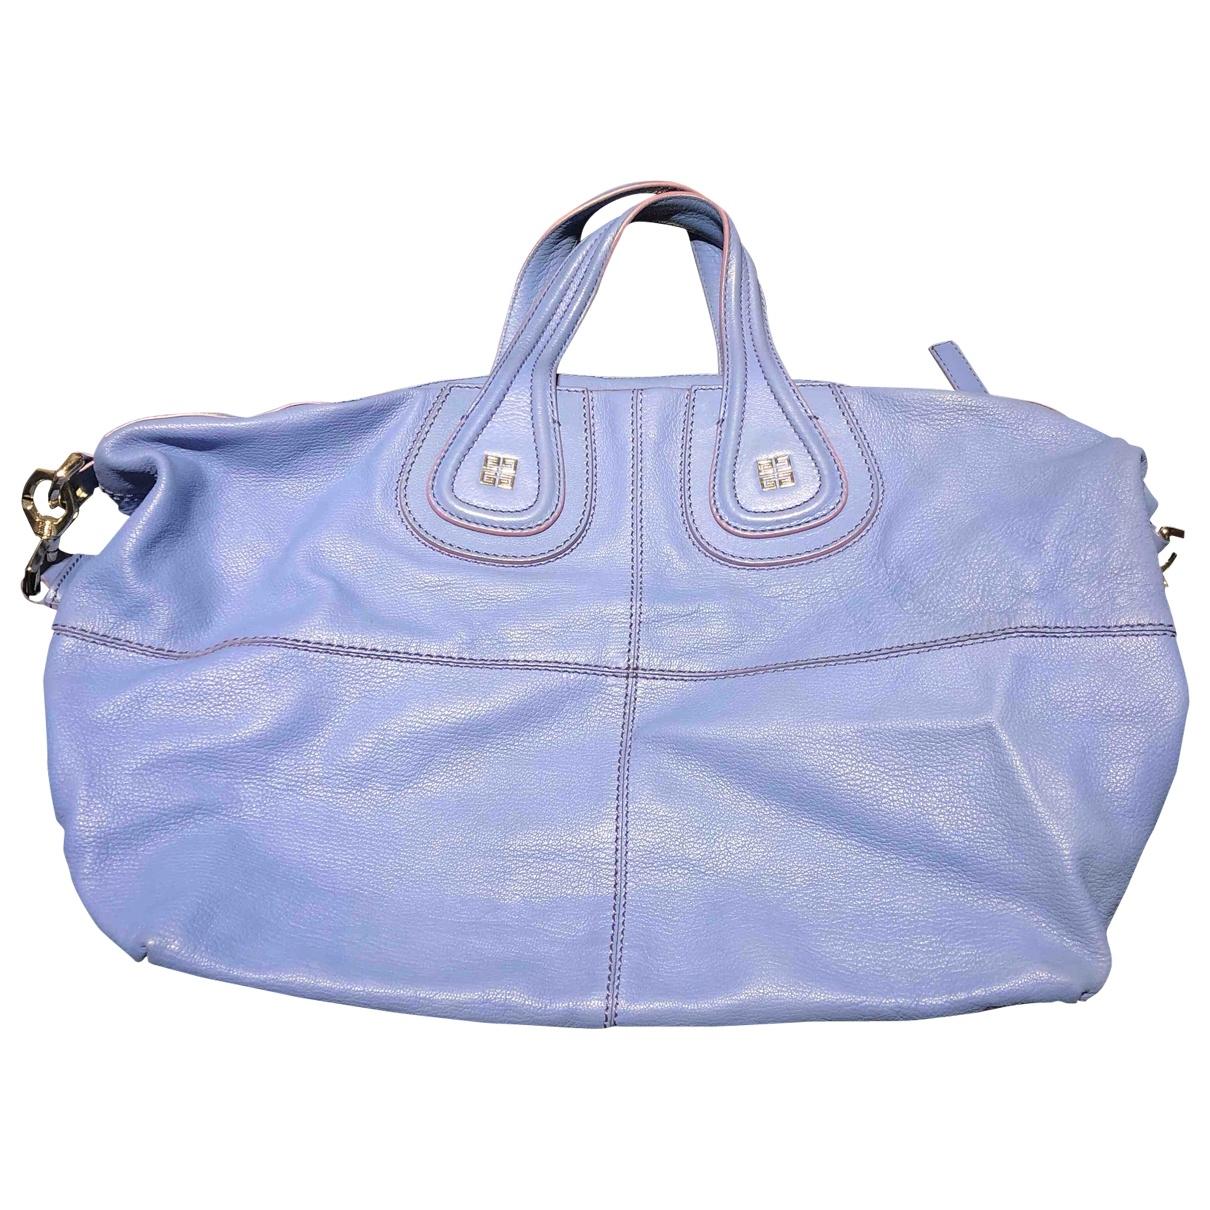 Givenchy Nightingale Blue Leather handbag for Women \N